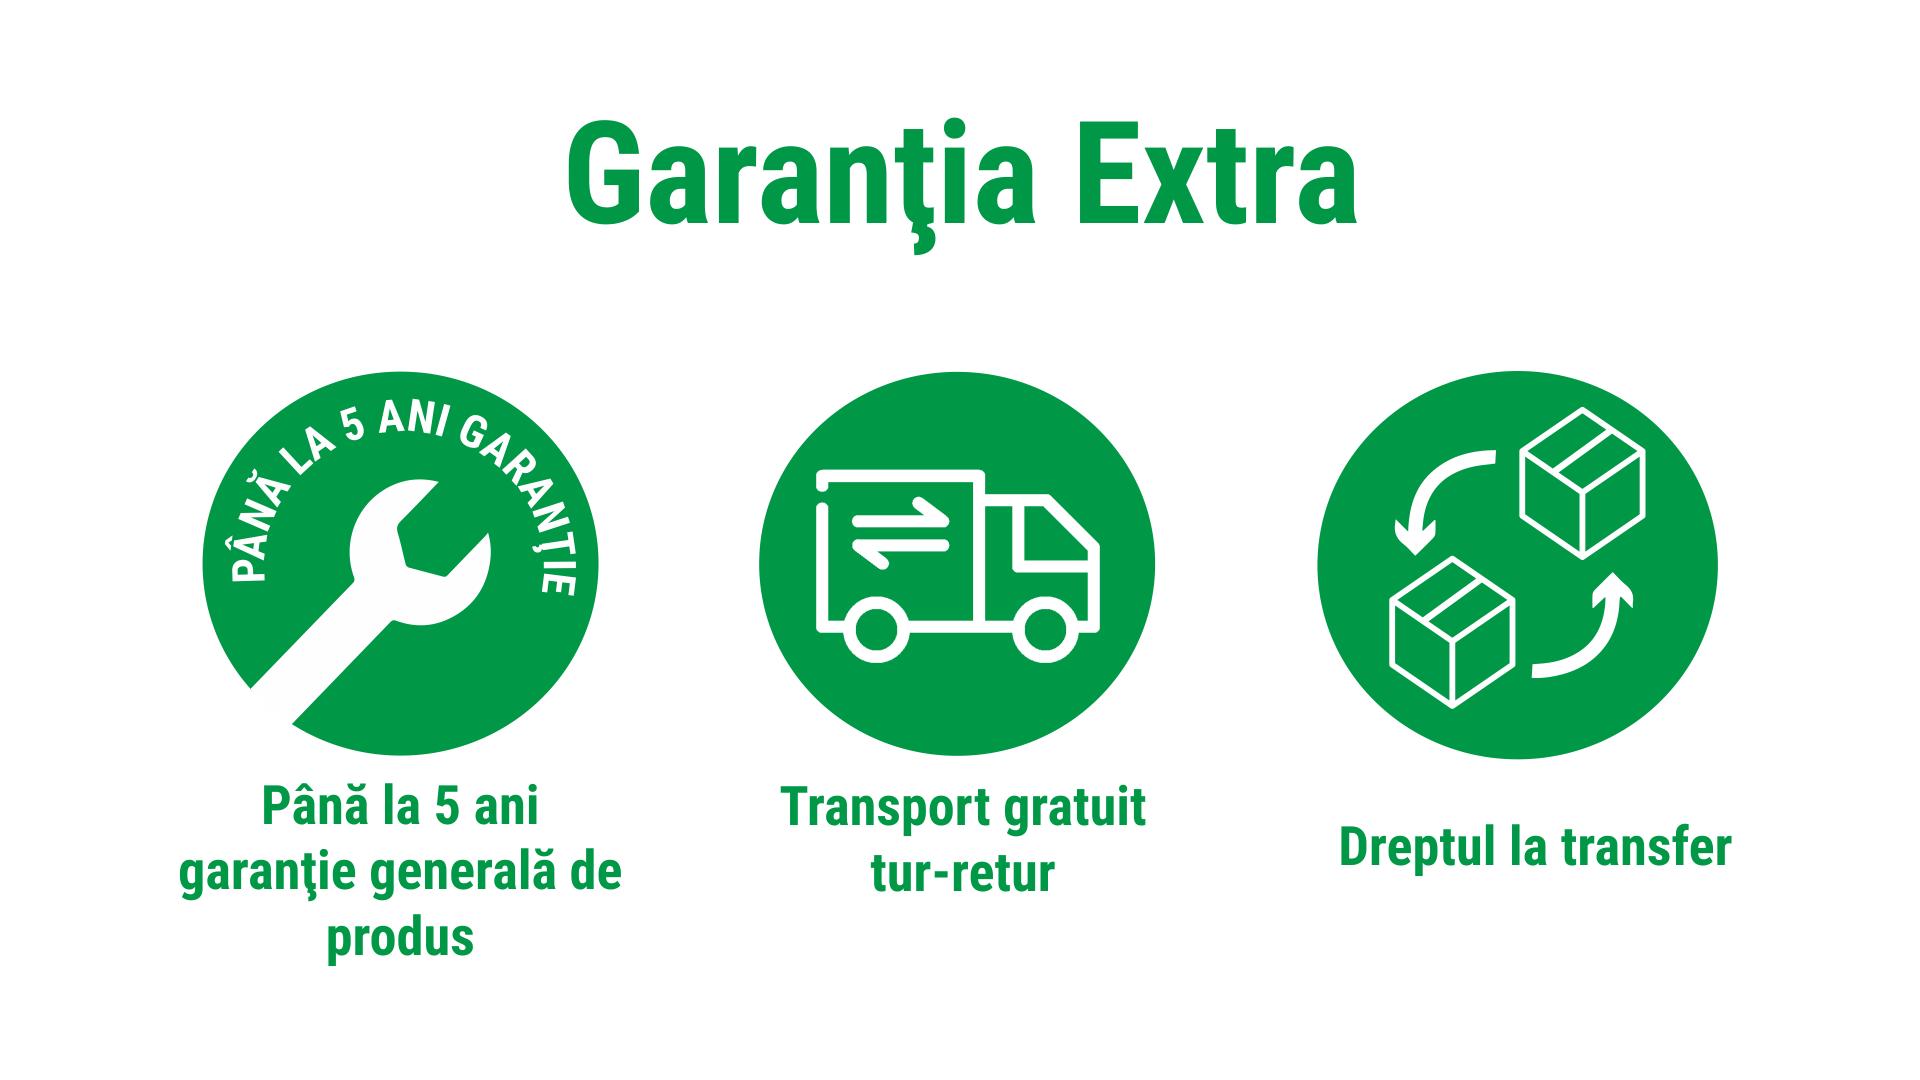 Garantie Extra